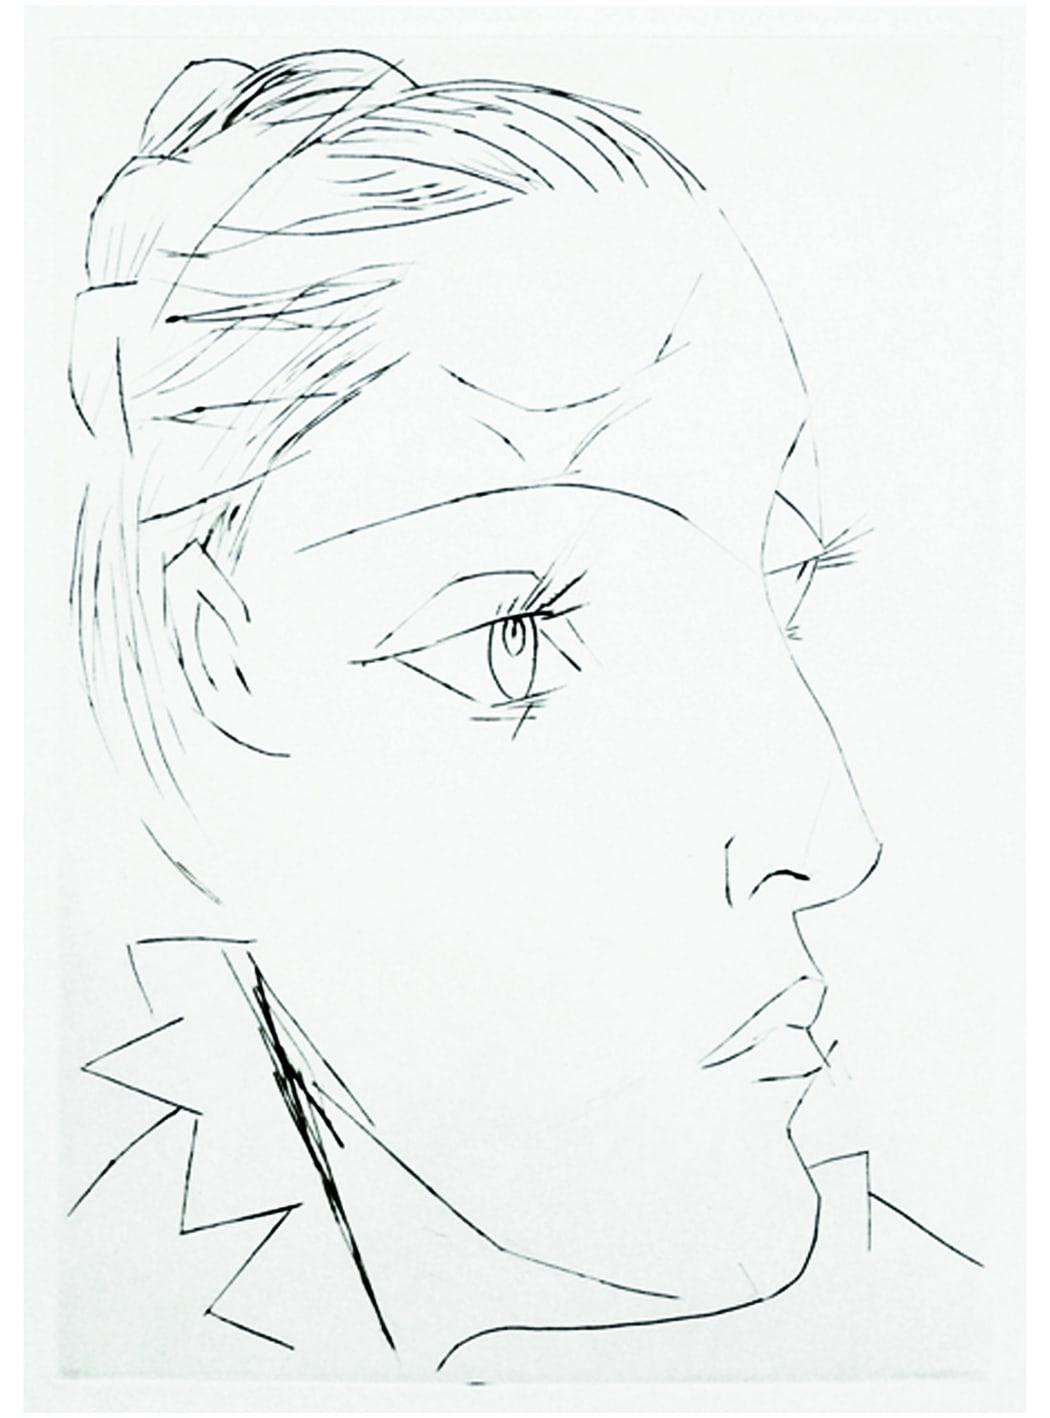 Portrait de Dora Maar au Chignon. II (Bloch 292), 1936, drypoint, 20 1/4 x 15 3/4 inches